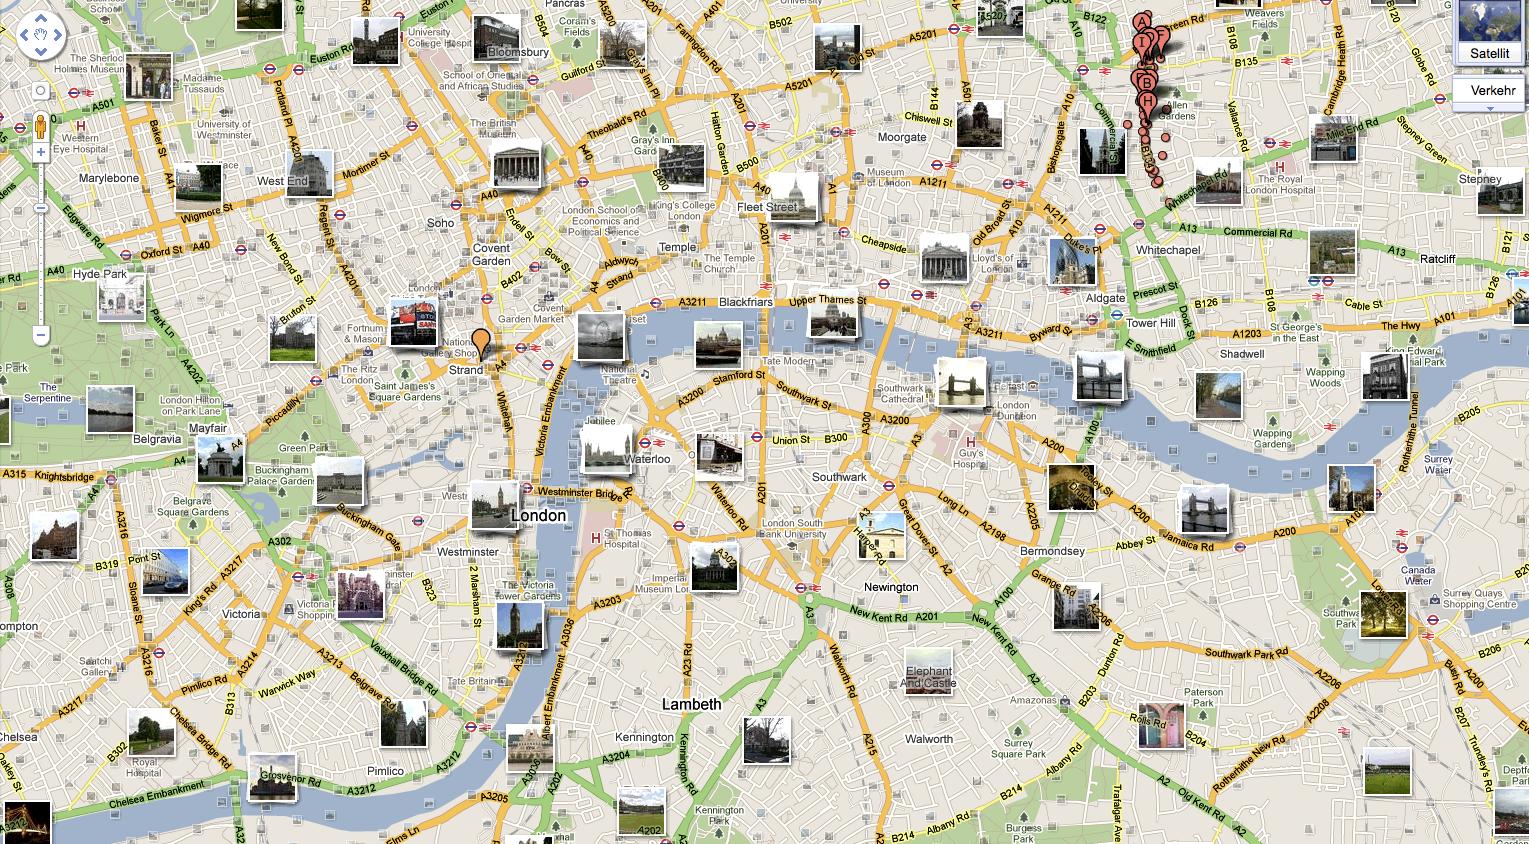 Tourist Map London.London Tourist Map Travel Tourism